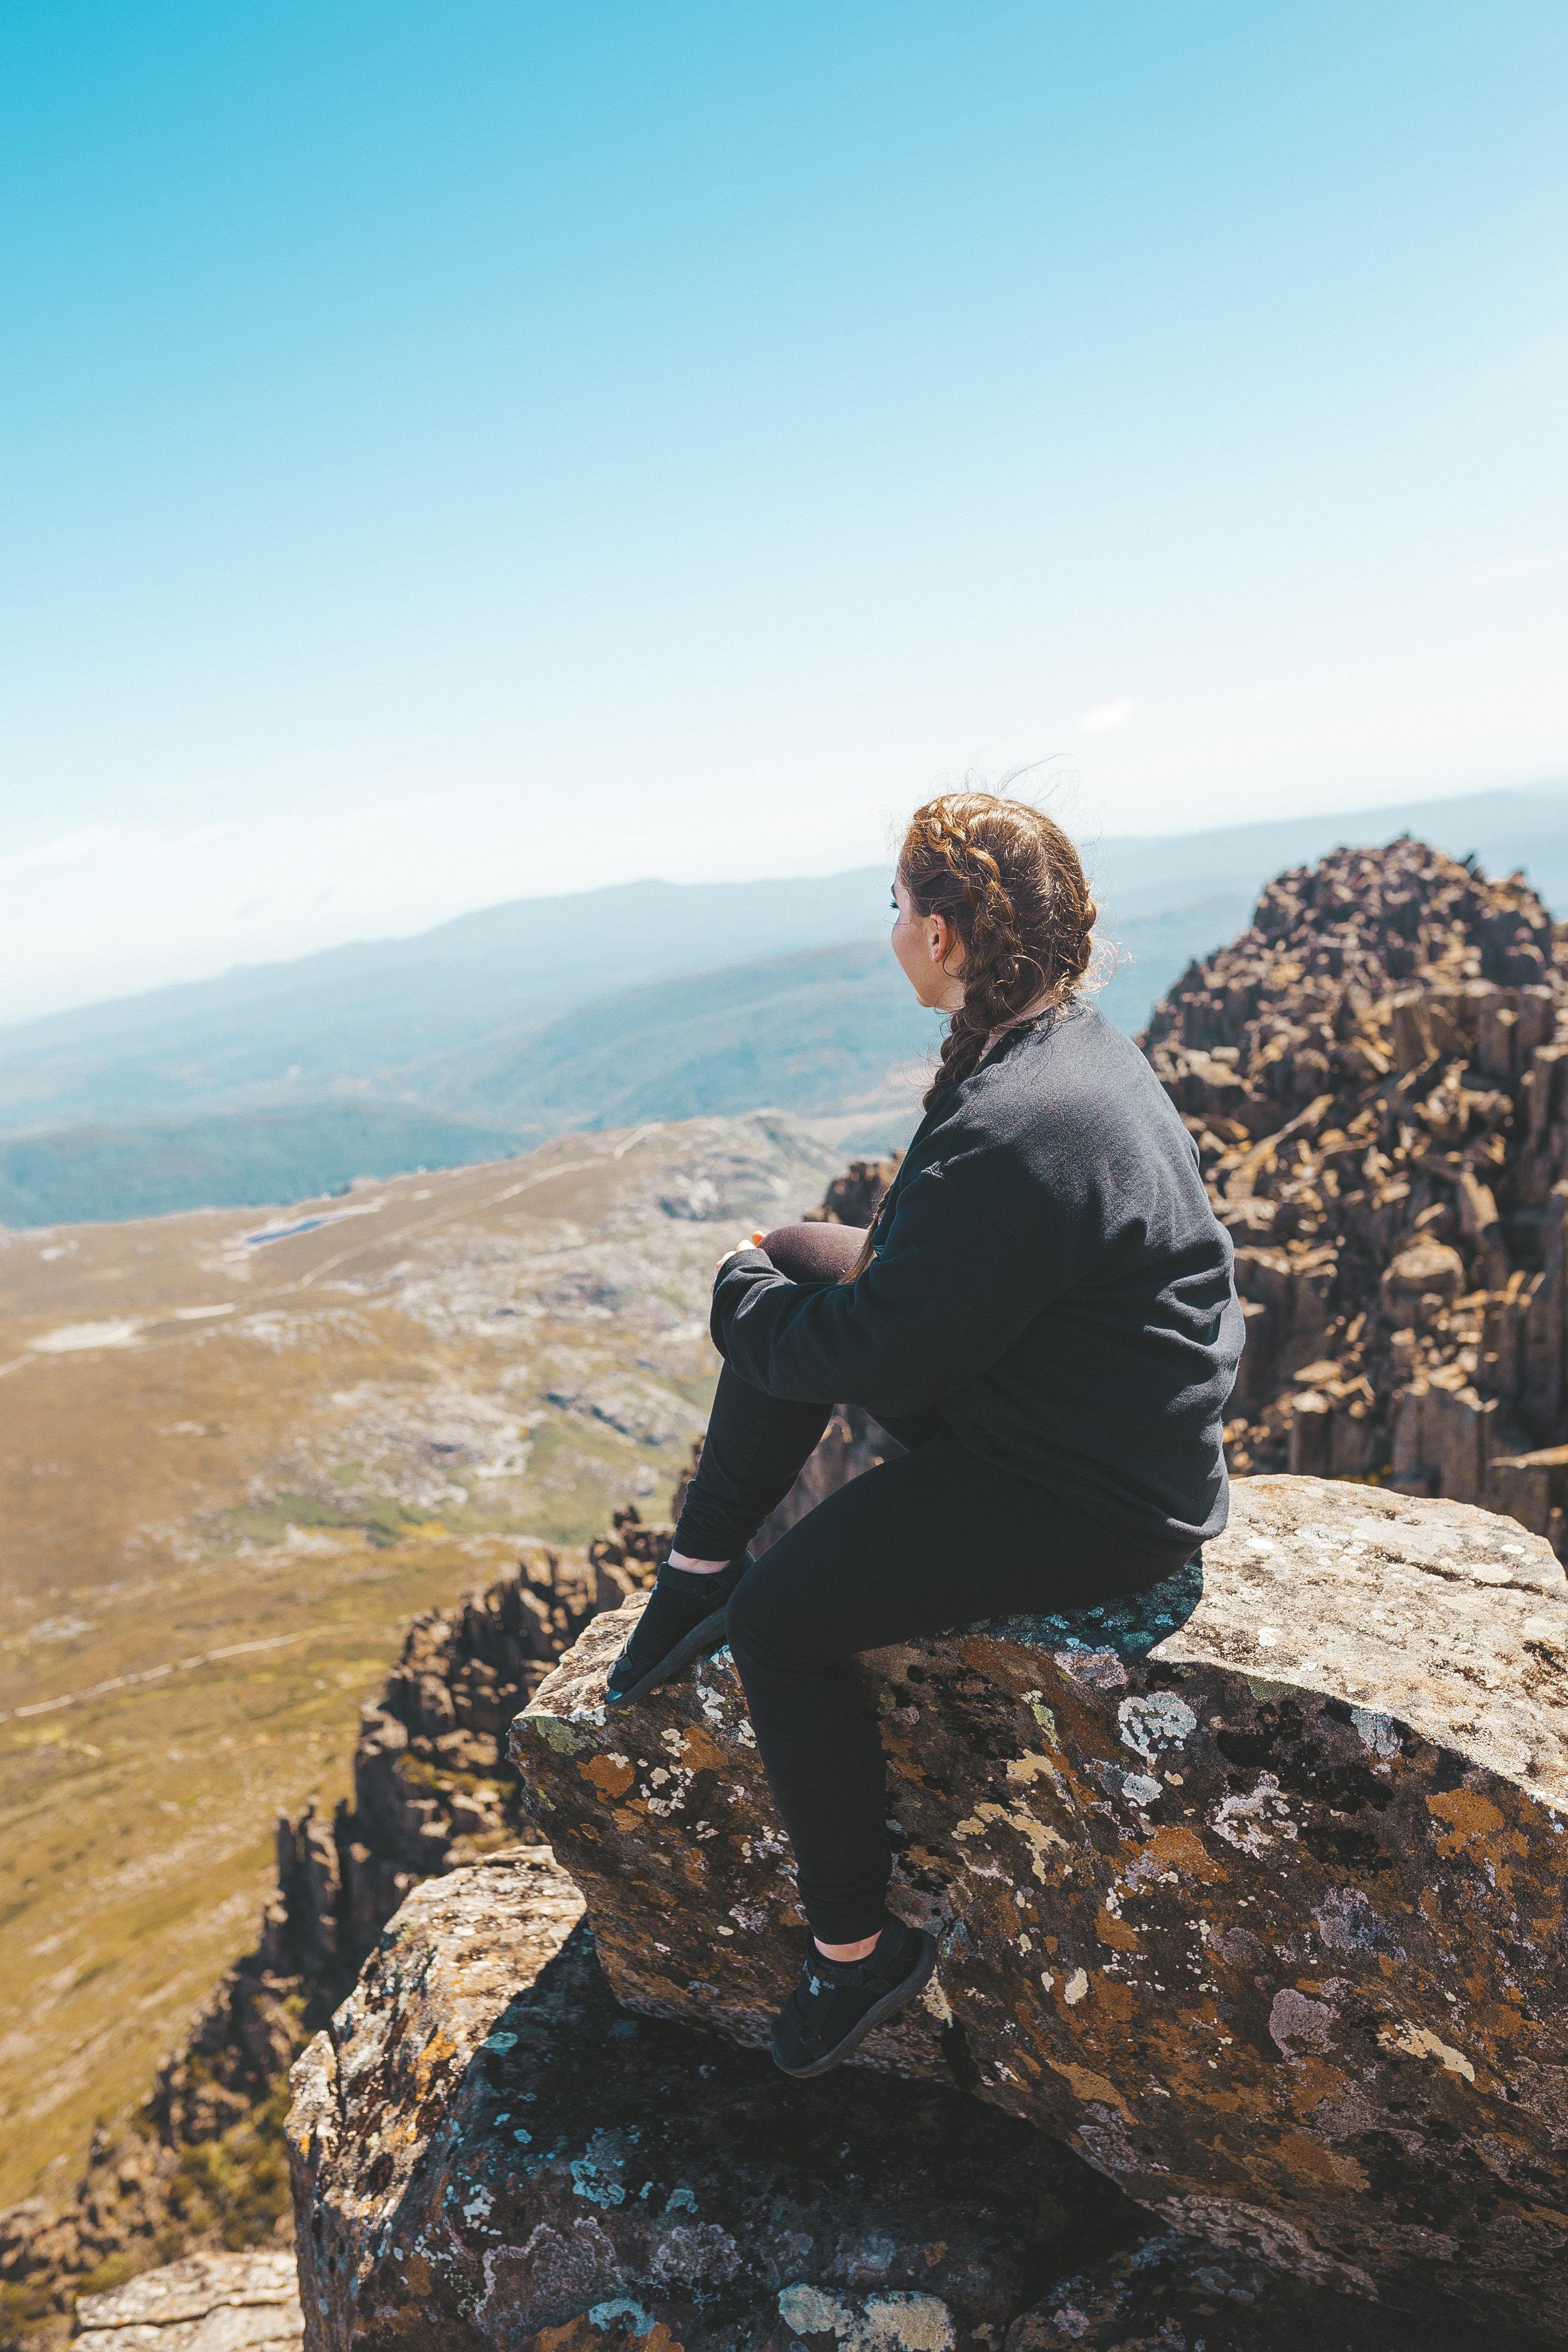 cradle mountain summit hike review tasmania-31.jpg